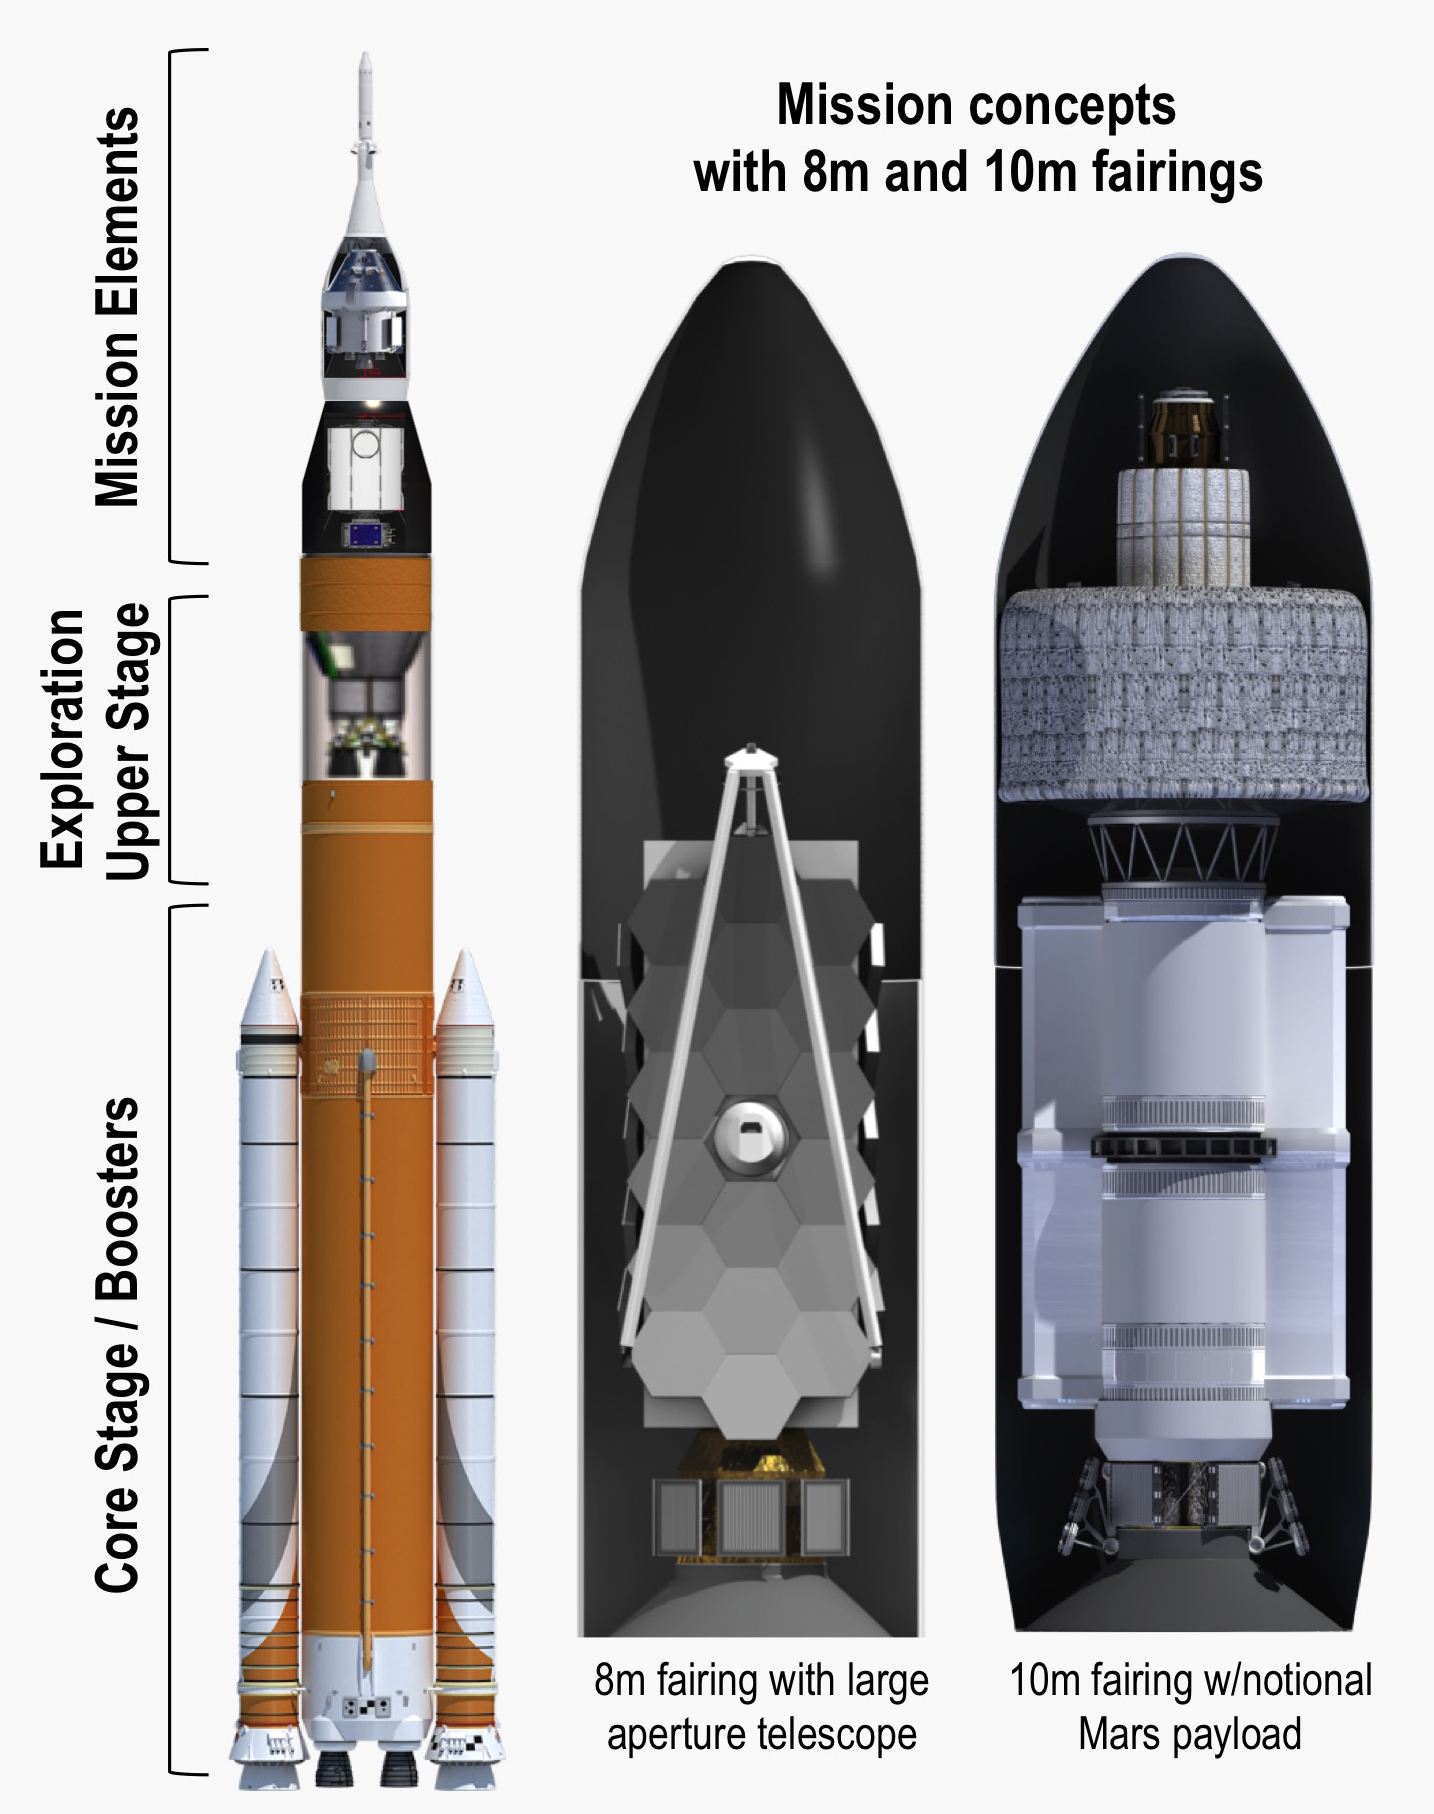 Na nasa new space shuttle design - Sls Block 1b Mission Concepts